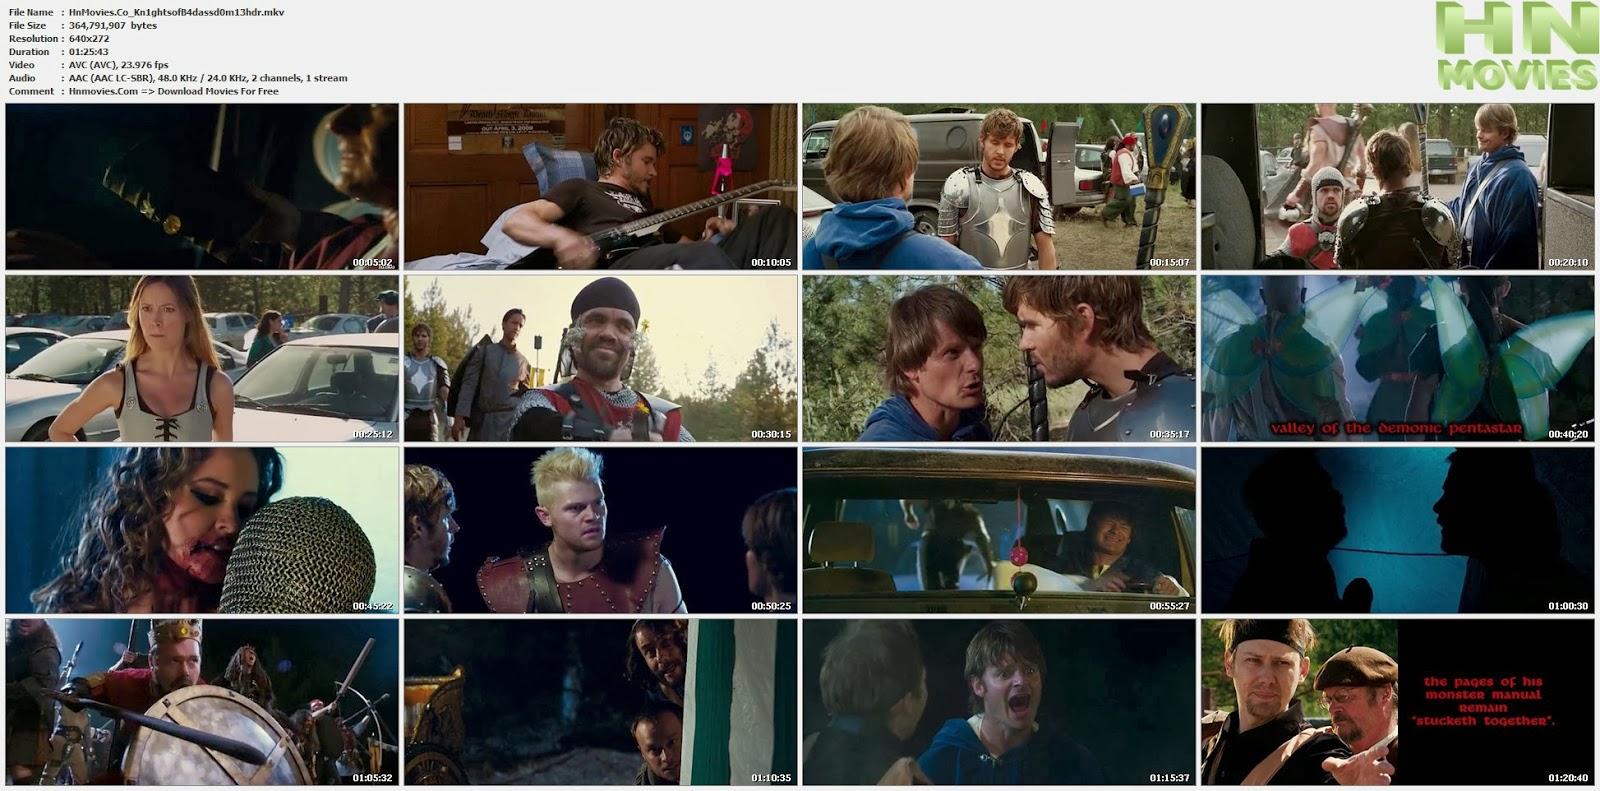 movie screenshot of Knights of Badassdom fdmovie.com